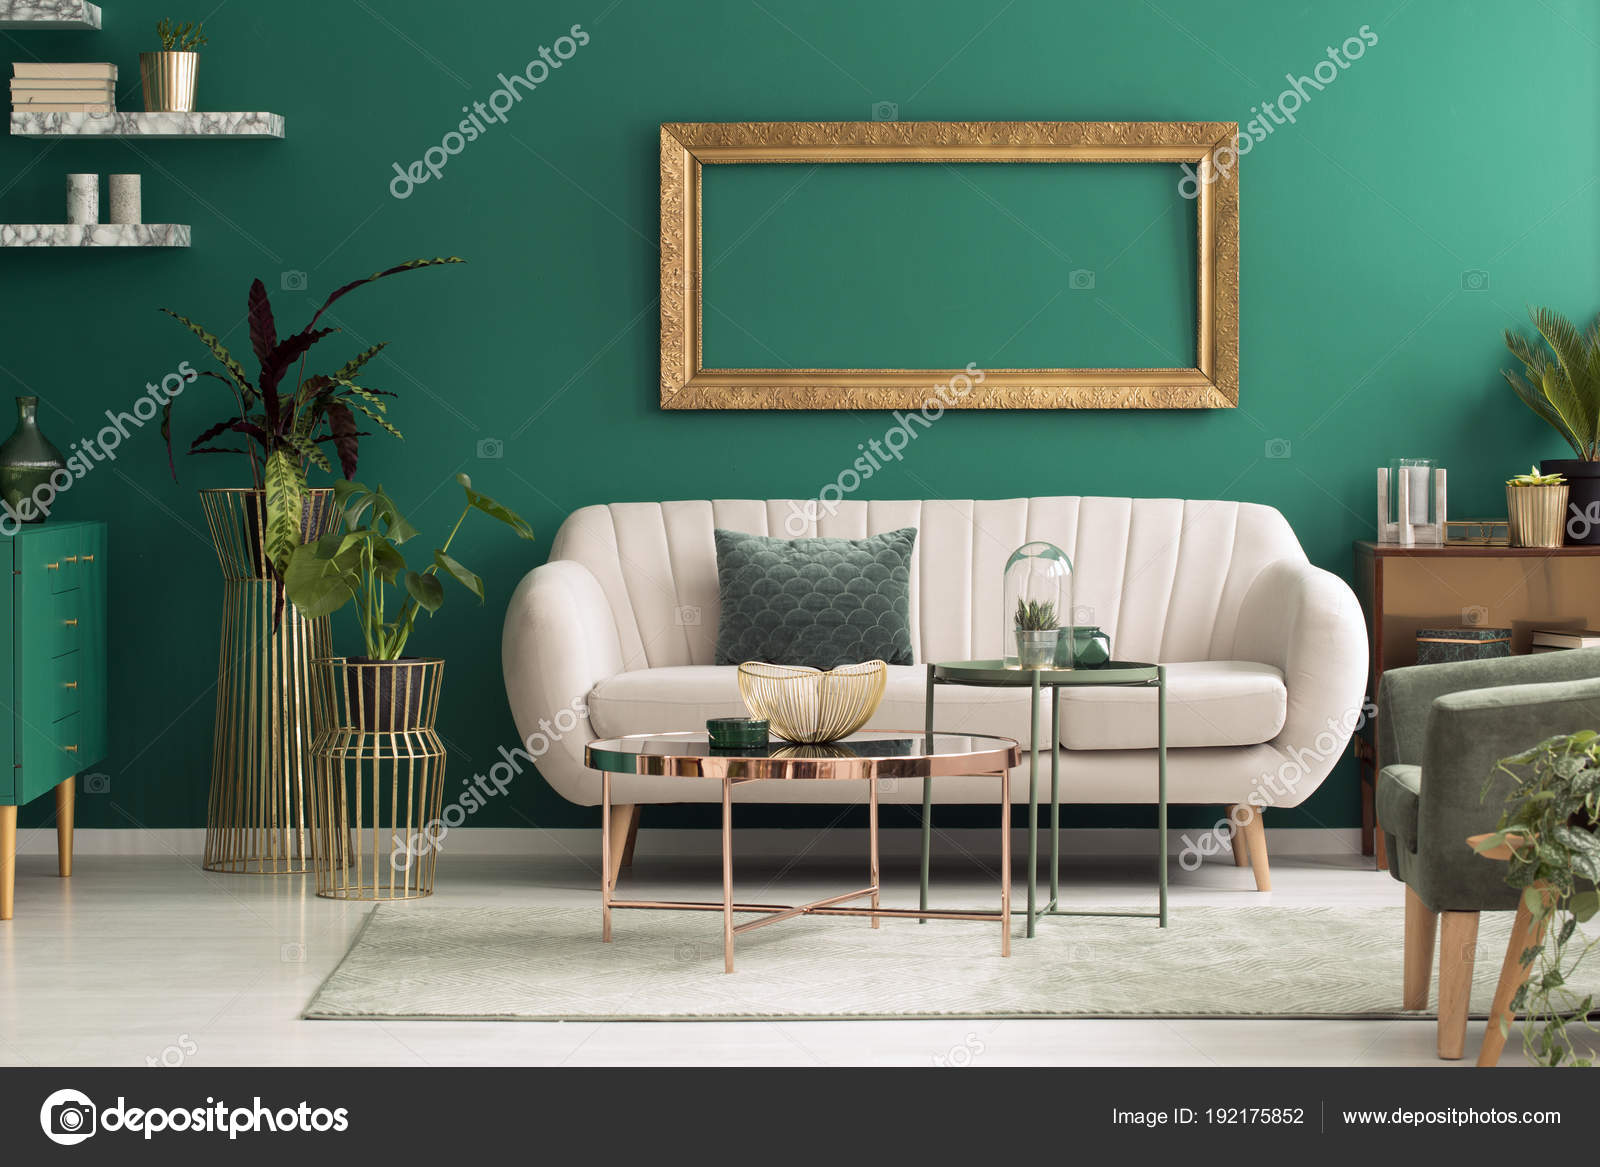 Beige sofa in groen interieur — Stockfoto © photographee.eu #192175852